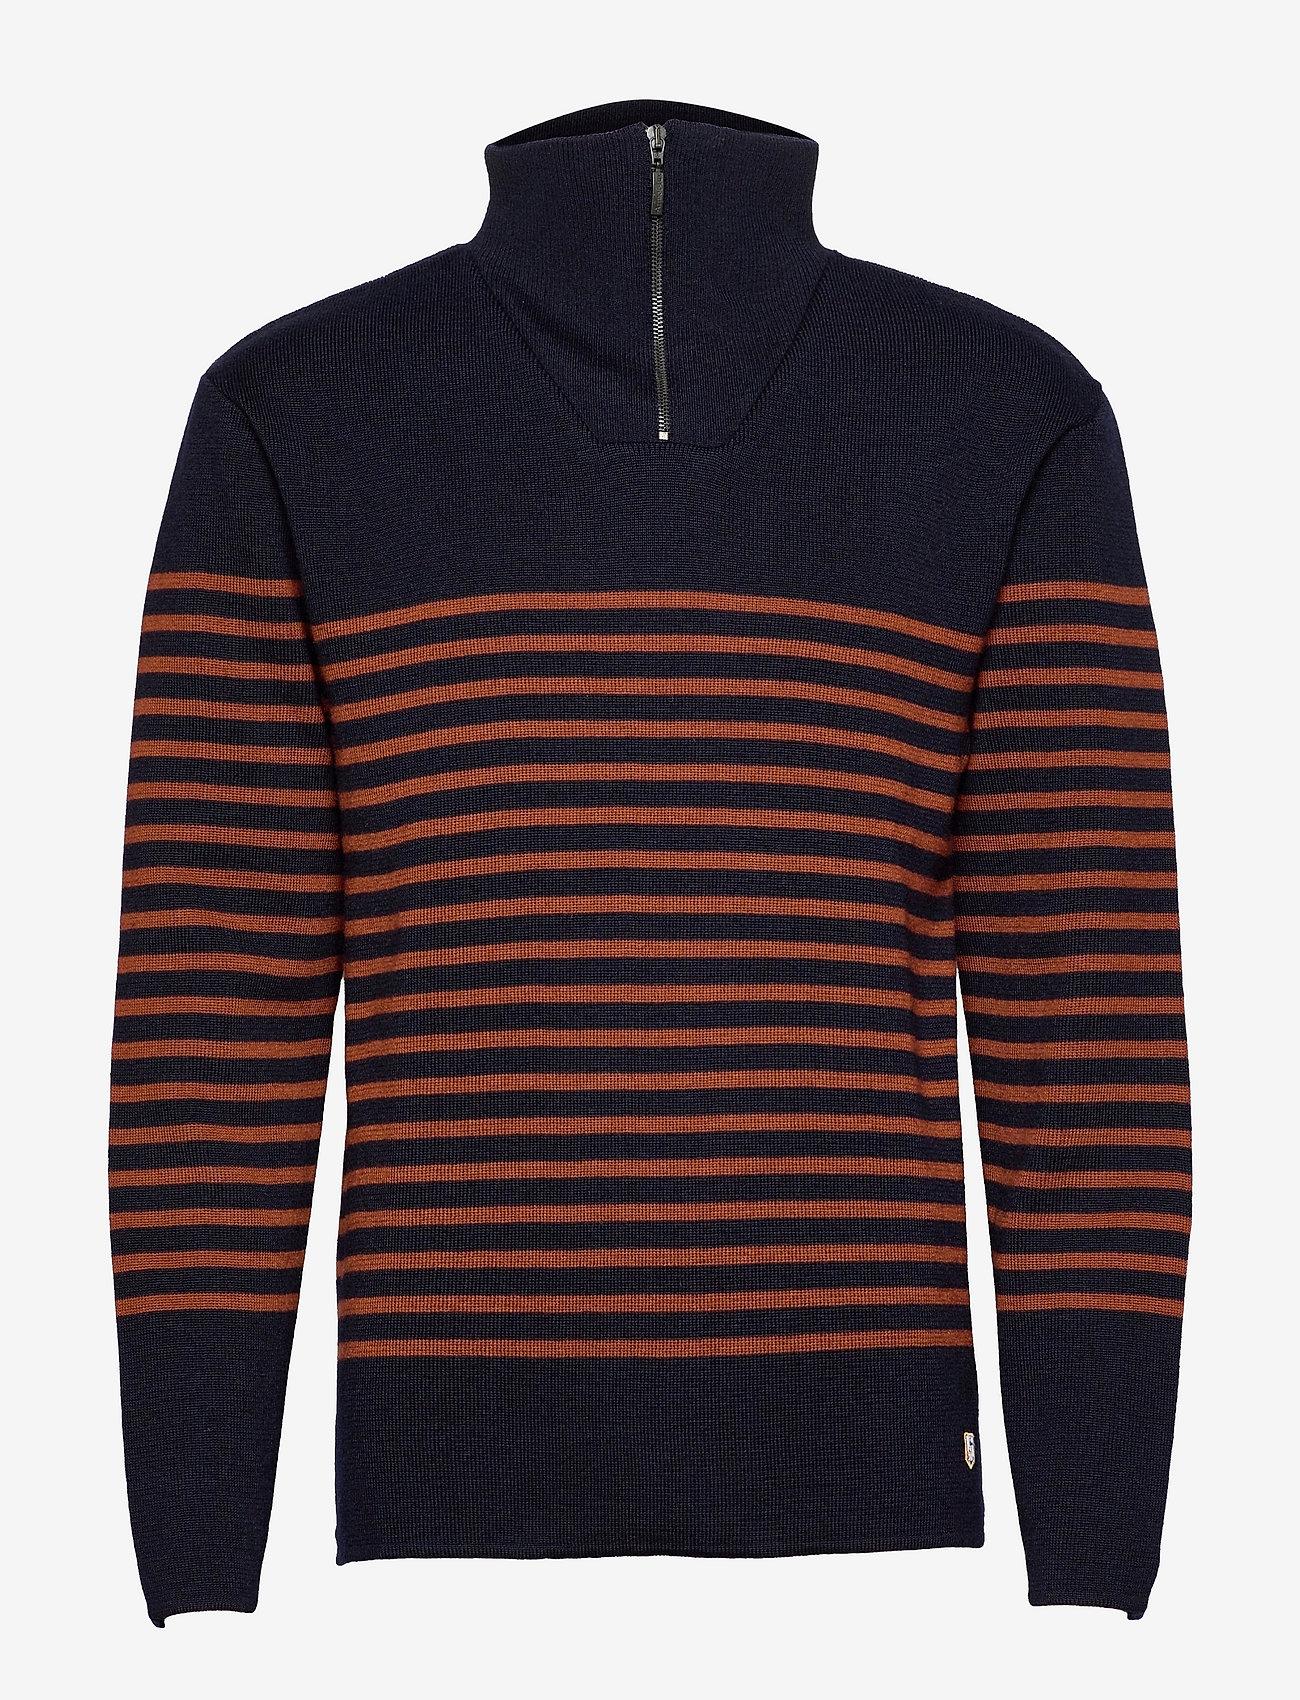 Armor Lux - Striped Mariner Sweater Héritage - half zip - navy/séquoia - 0